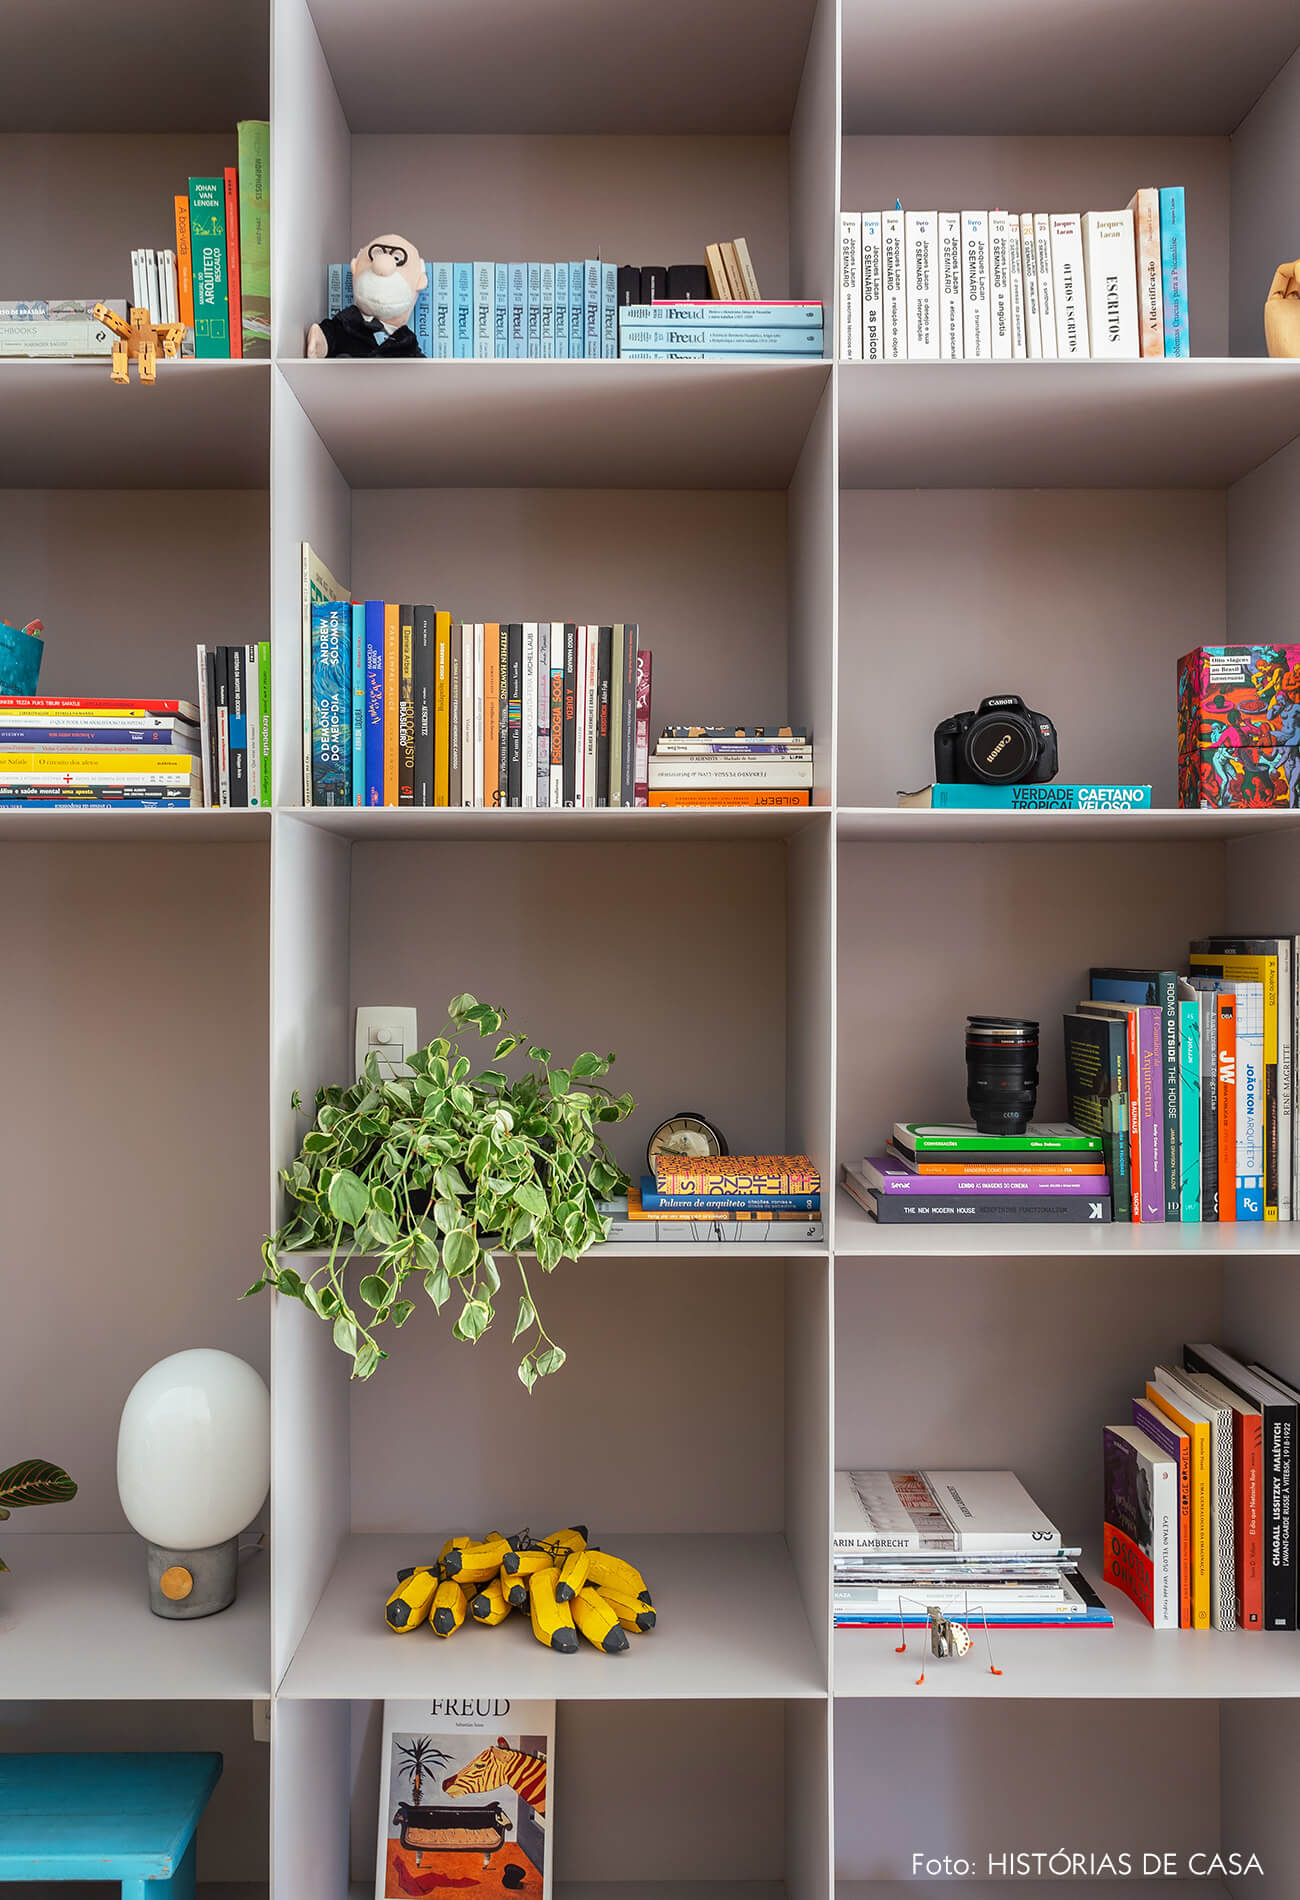 07-decoracao-apartamento-estante-metalica-cinza-serralheria